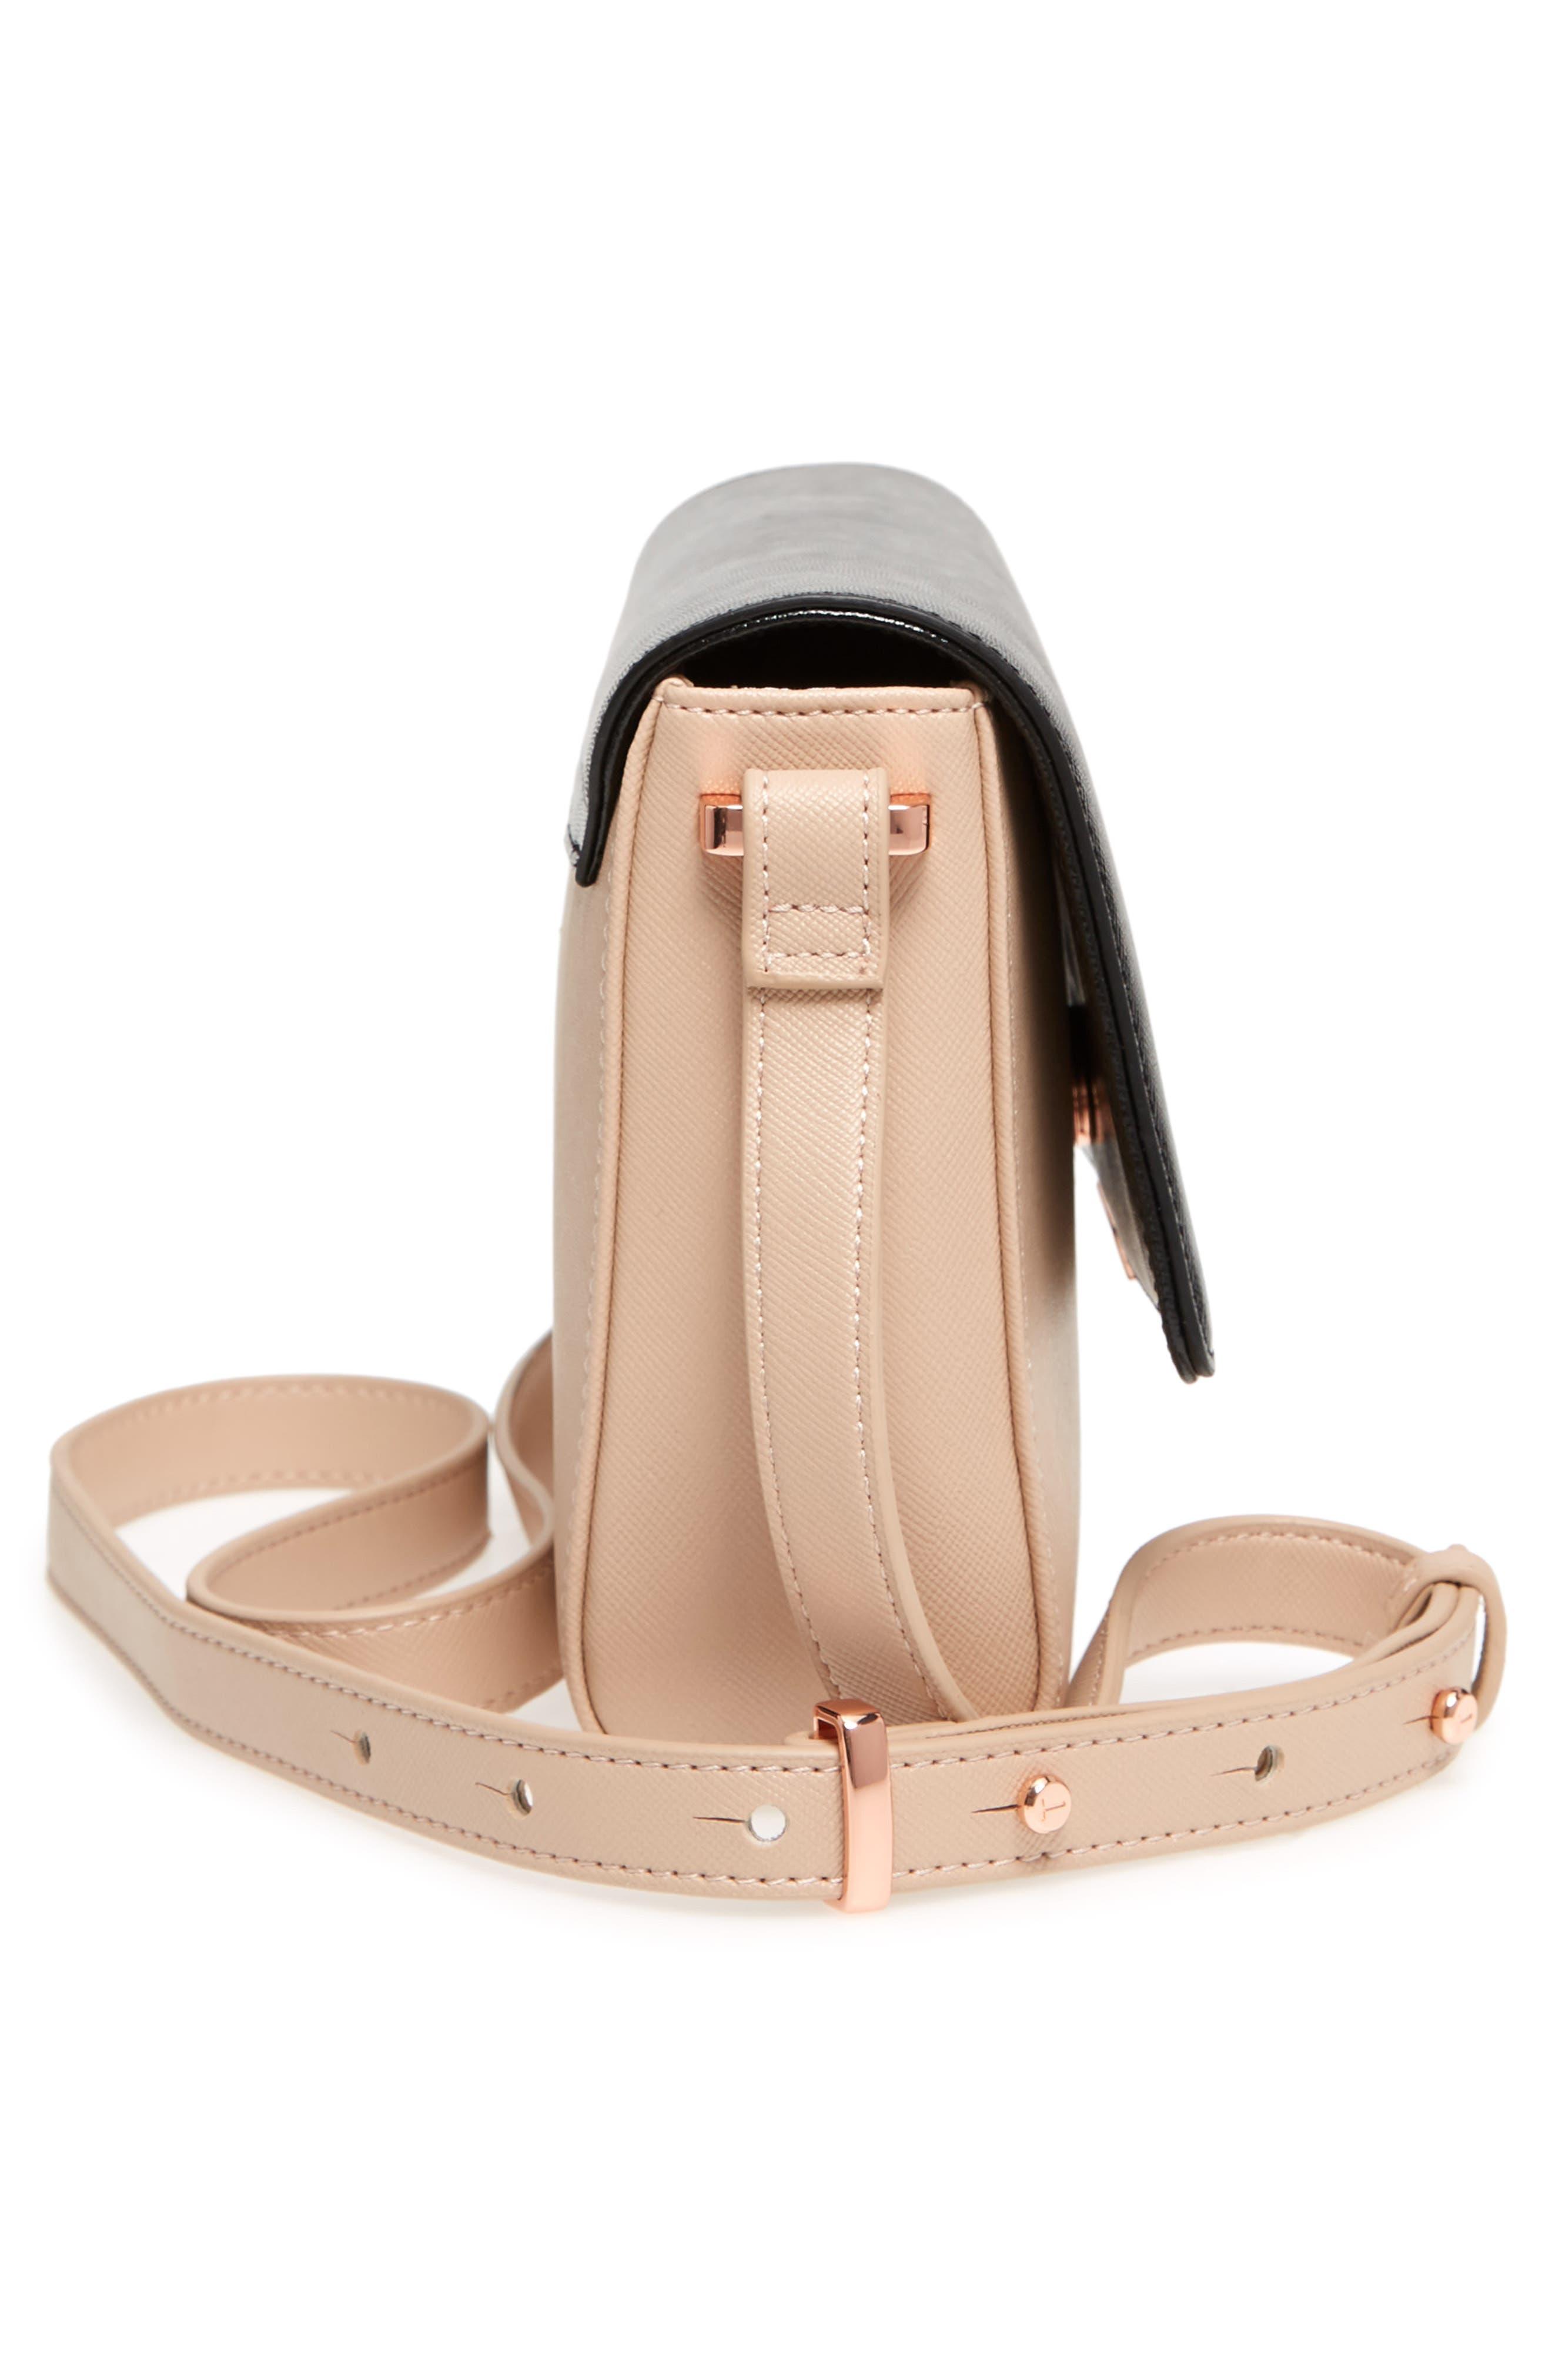 Demonda Faux Leather Crossbody Bag,                             Alternate thumbnail 5, color,                             Taupe